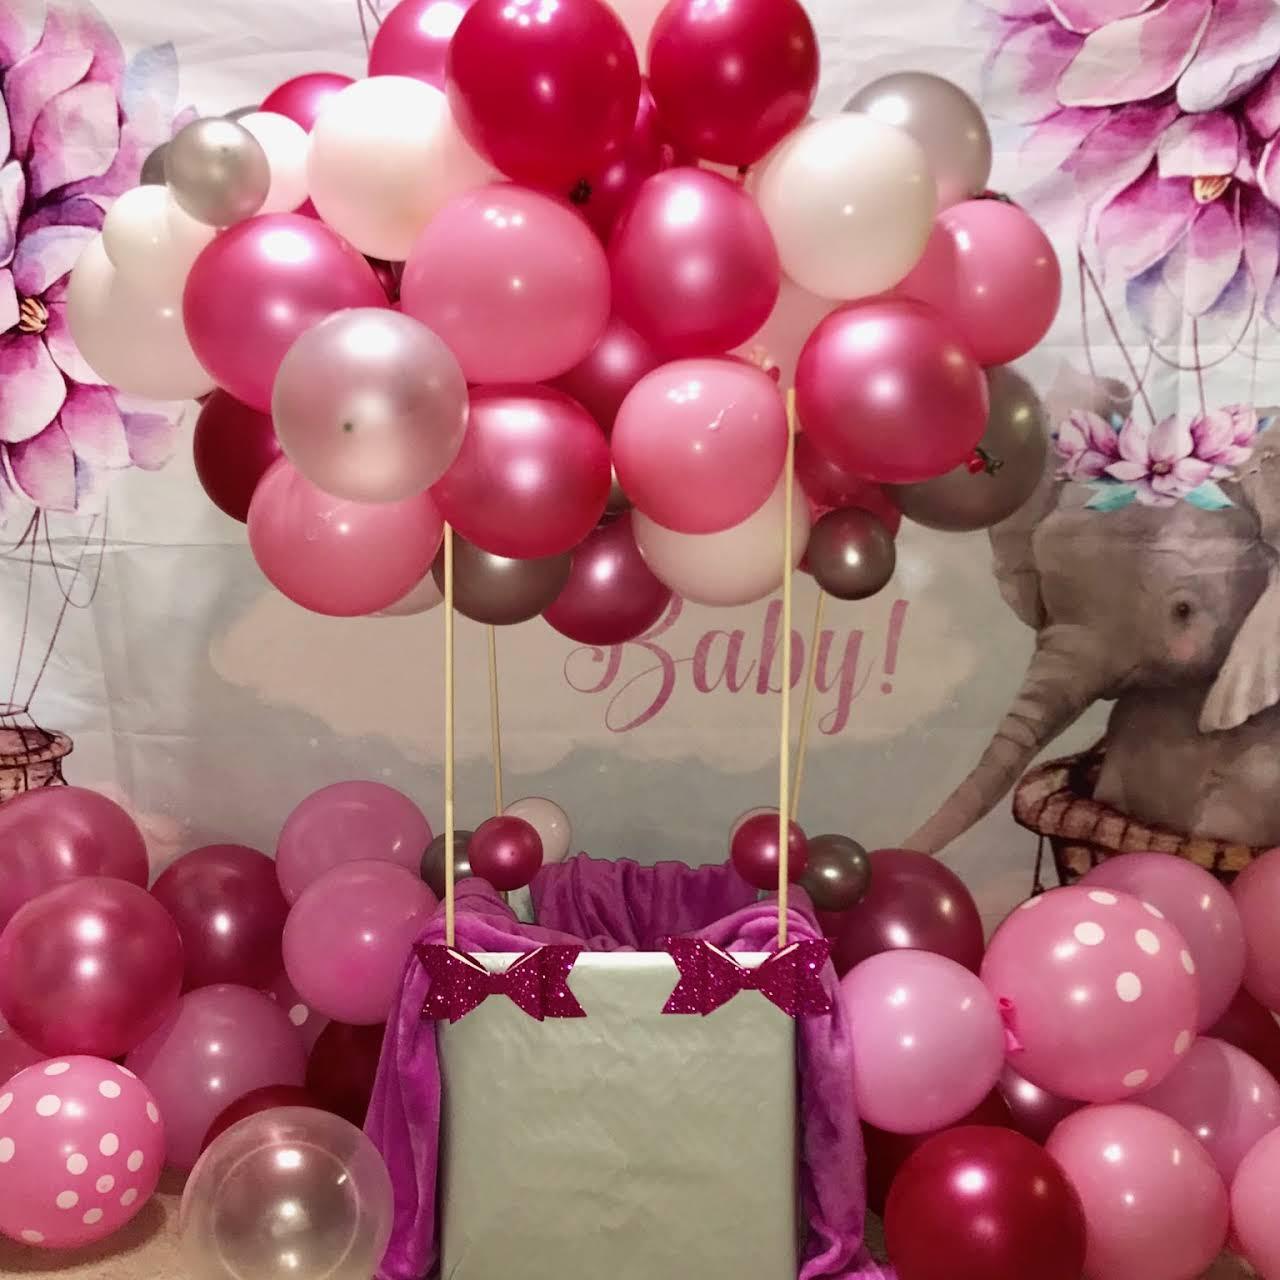 Bella S Balloon Decor Balloon Art For Weddings Anniversary